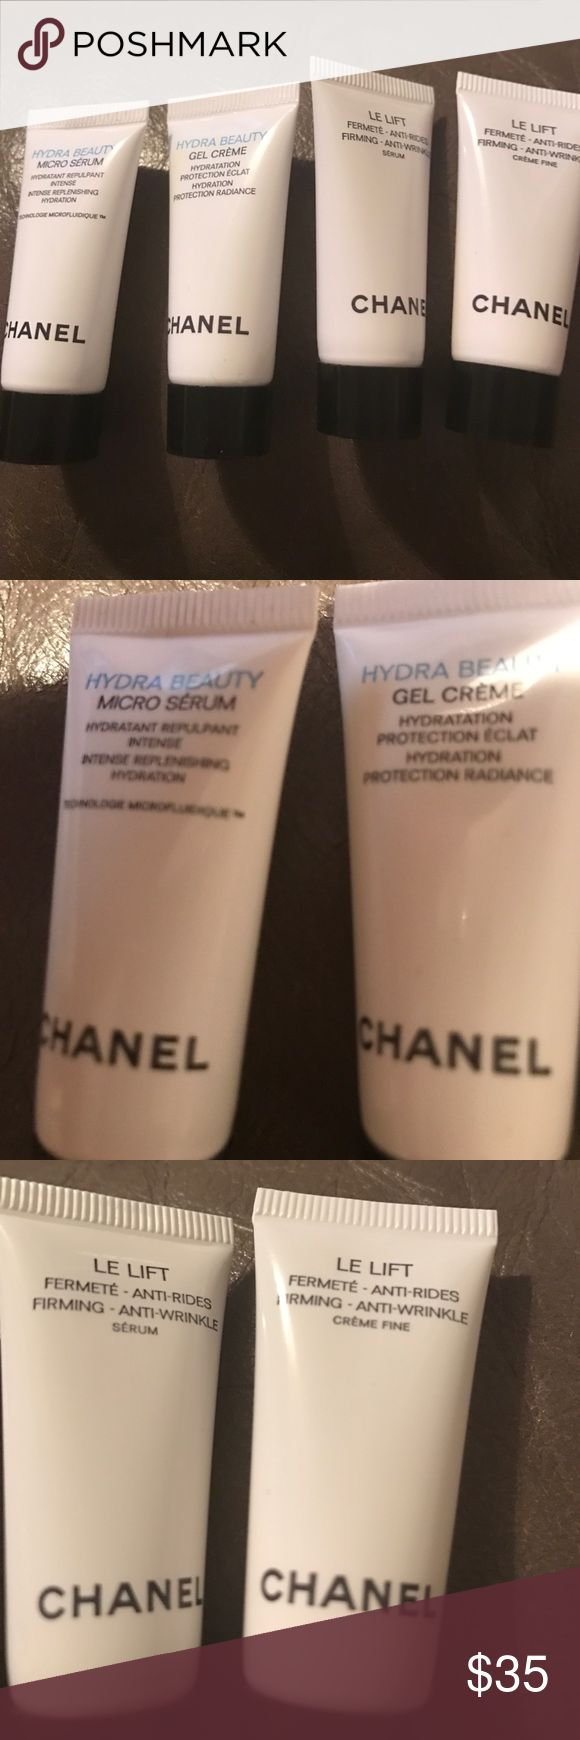 Chanel face product Chanel hydra beauty micro serum 0.17 fluid ounces... Chanel hydra beauty gel cream 0.17 fluid ounces..... Chanel LE LIFT firming  serum 0.17 fl oz....Chanel LE LIFT firming creme fine 0.17 fl oz CHANEL Makeup Luminizer